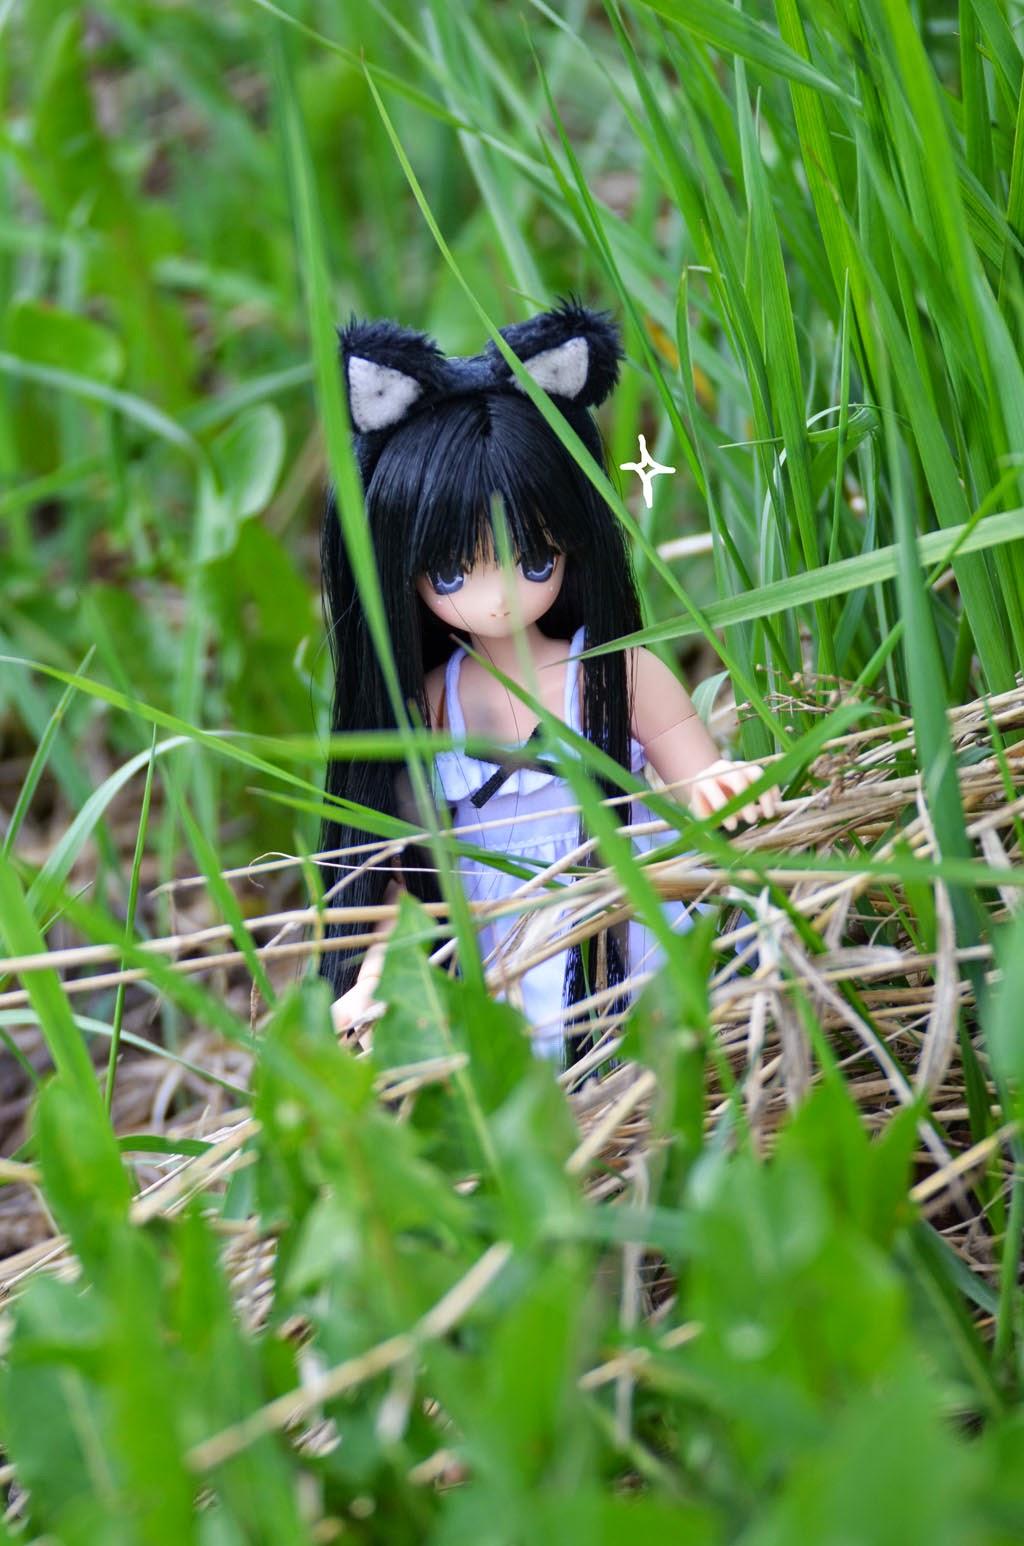 neko-san aika azone doll